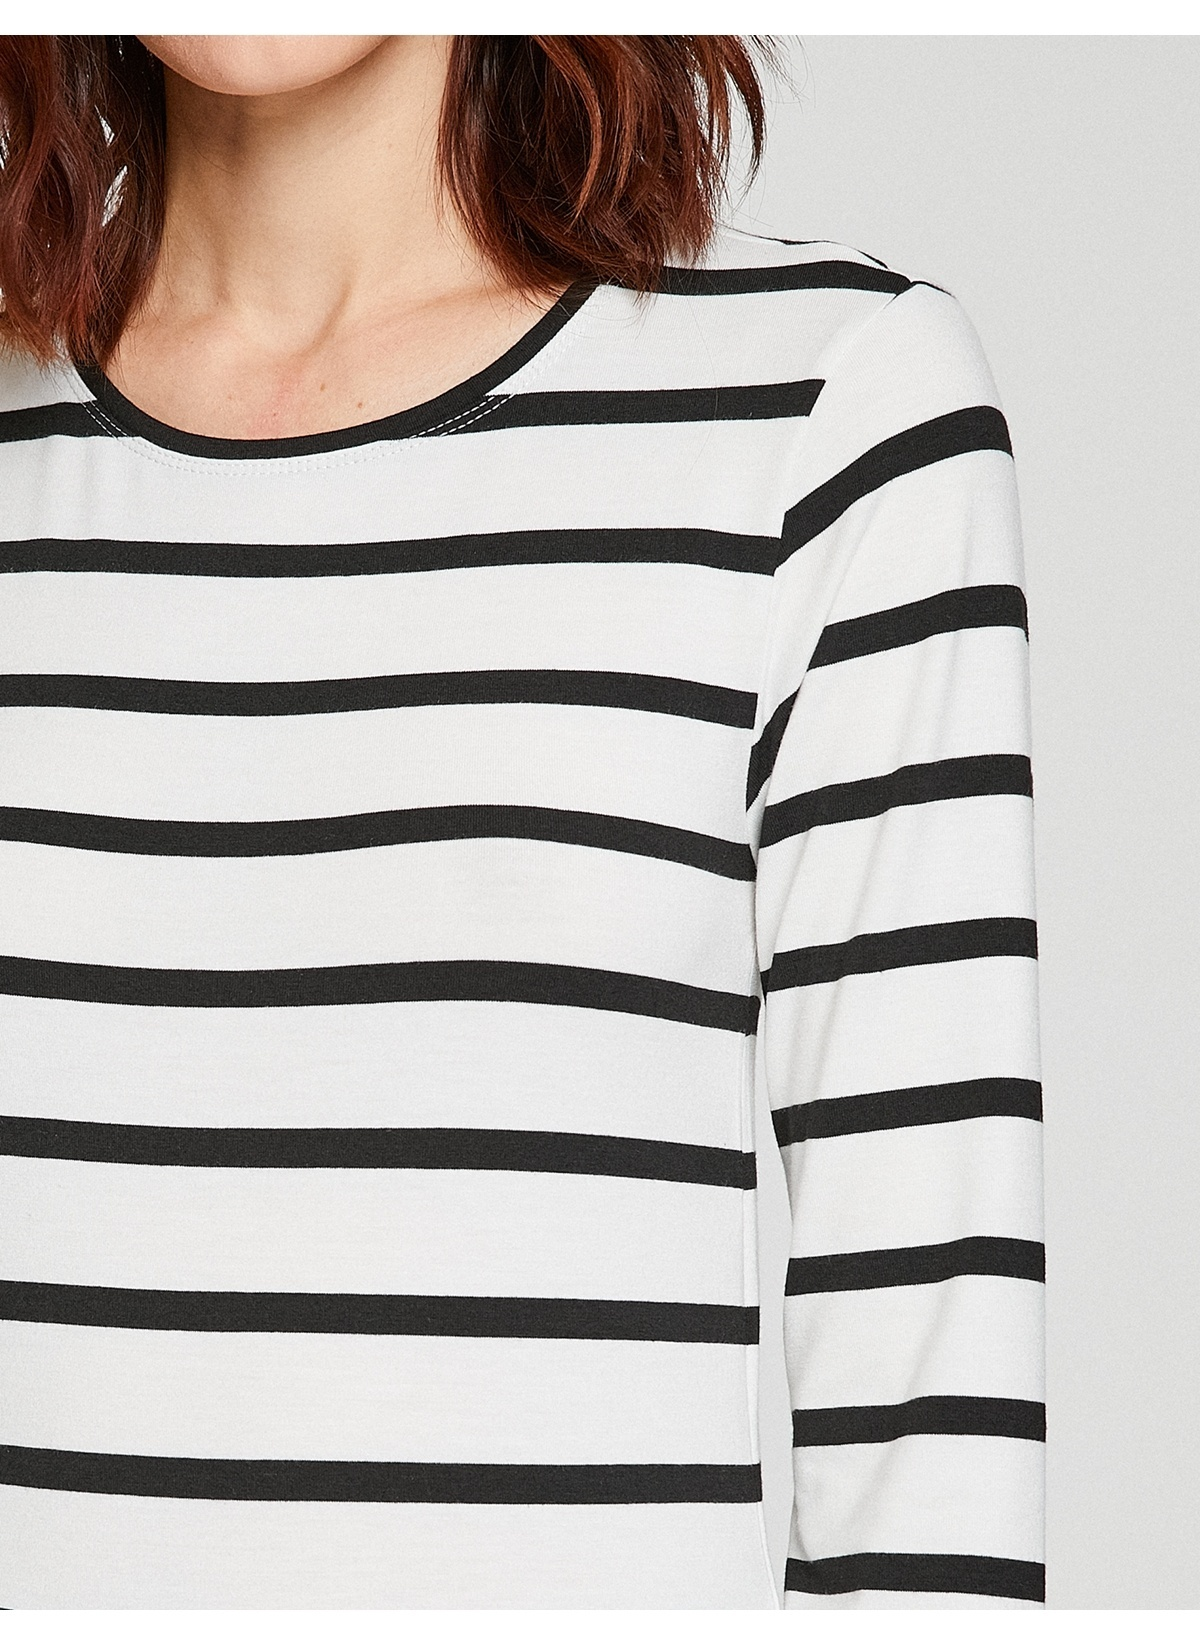 449175a9bd1cb Koton Kadın Uzun Kollu Çizgili Tişört Beyaz | Morhipo | 20661186